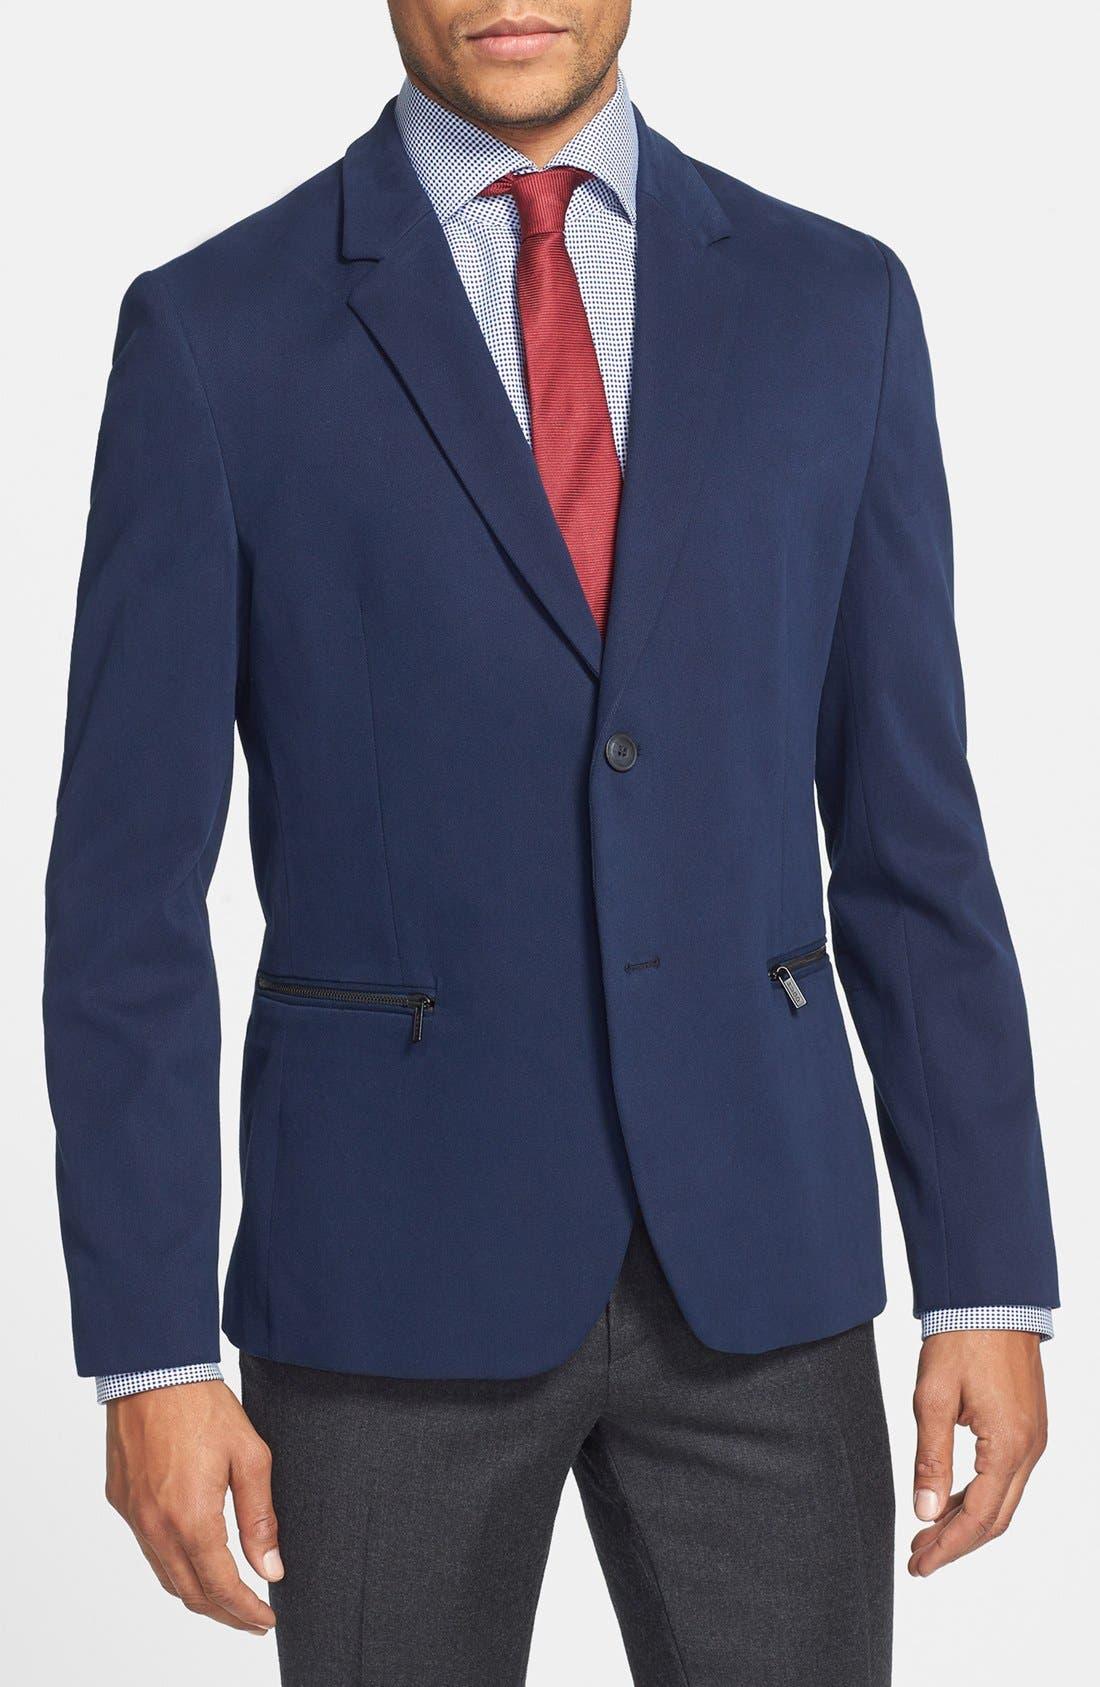 Alternate Image 1 Selected - HUGO 'Alston' Sportcoat